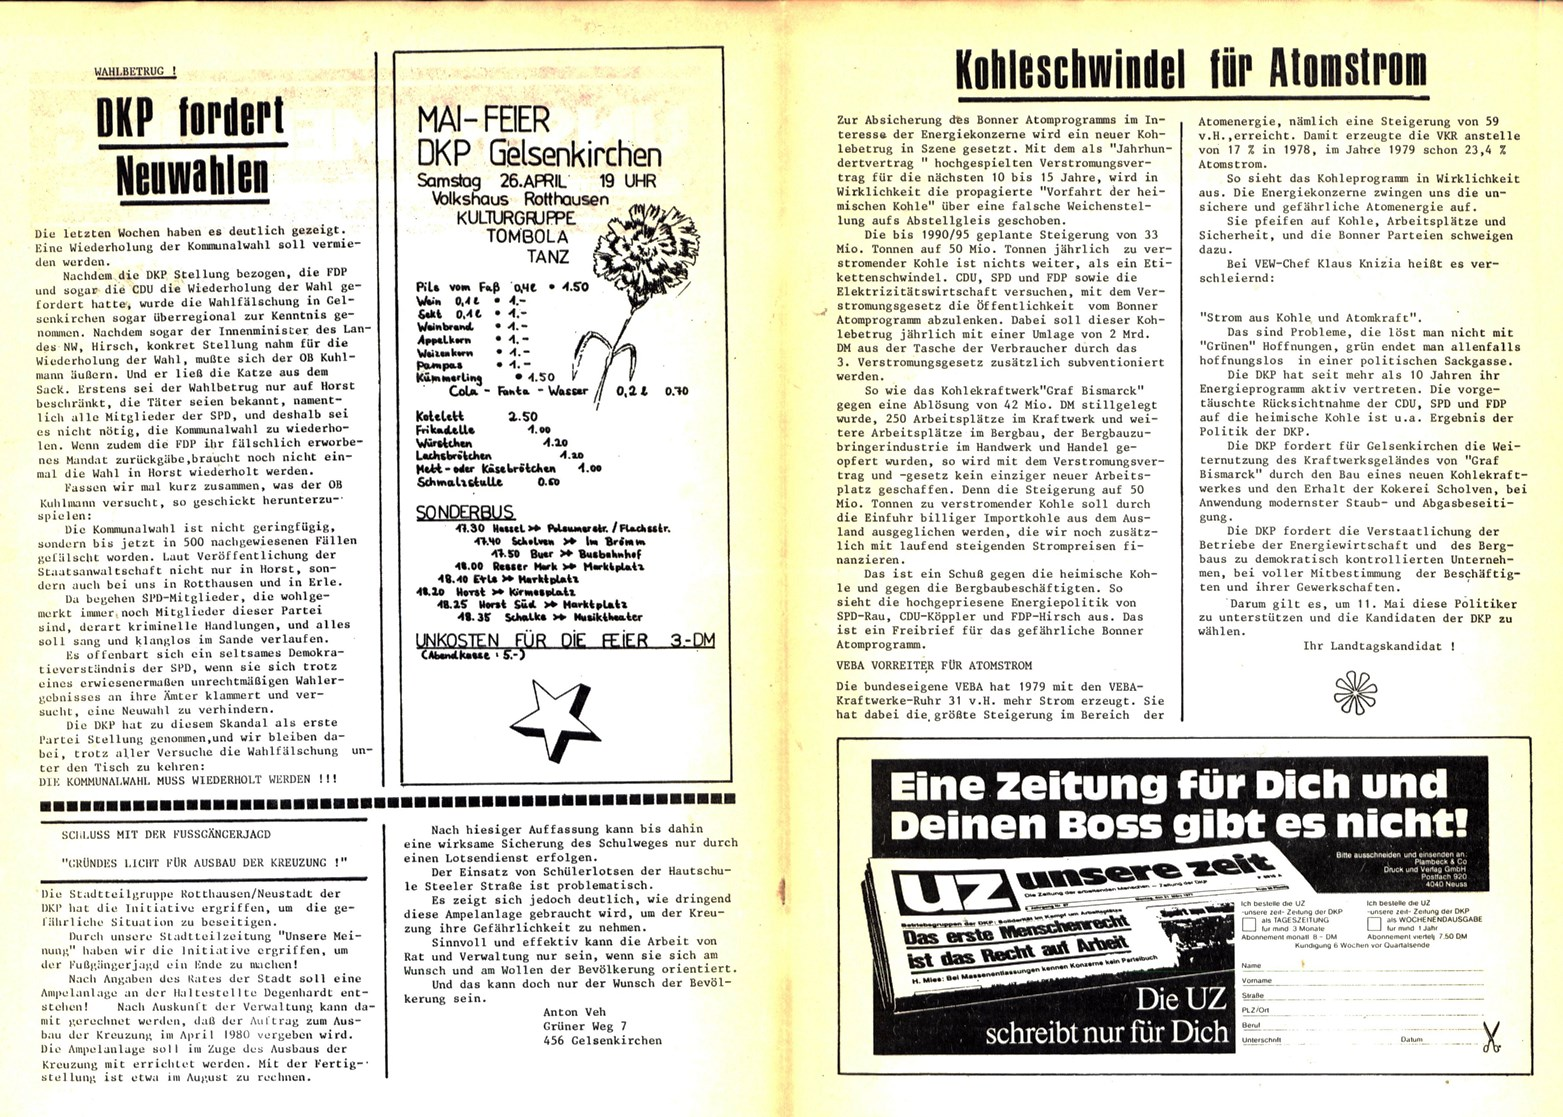 Gelsenkirchen_DKP_Unsere_Meinung_19800400_02